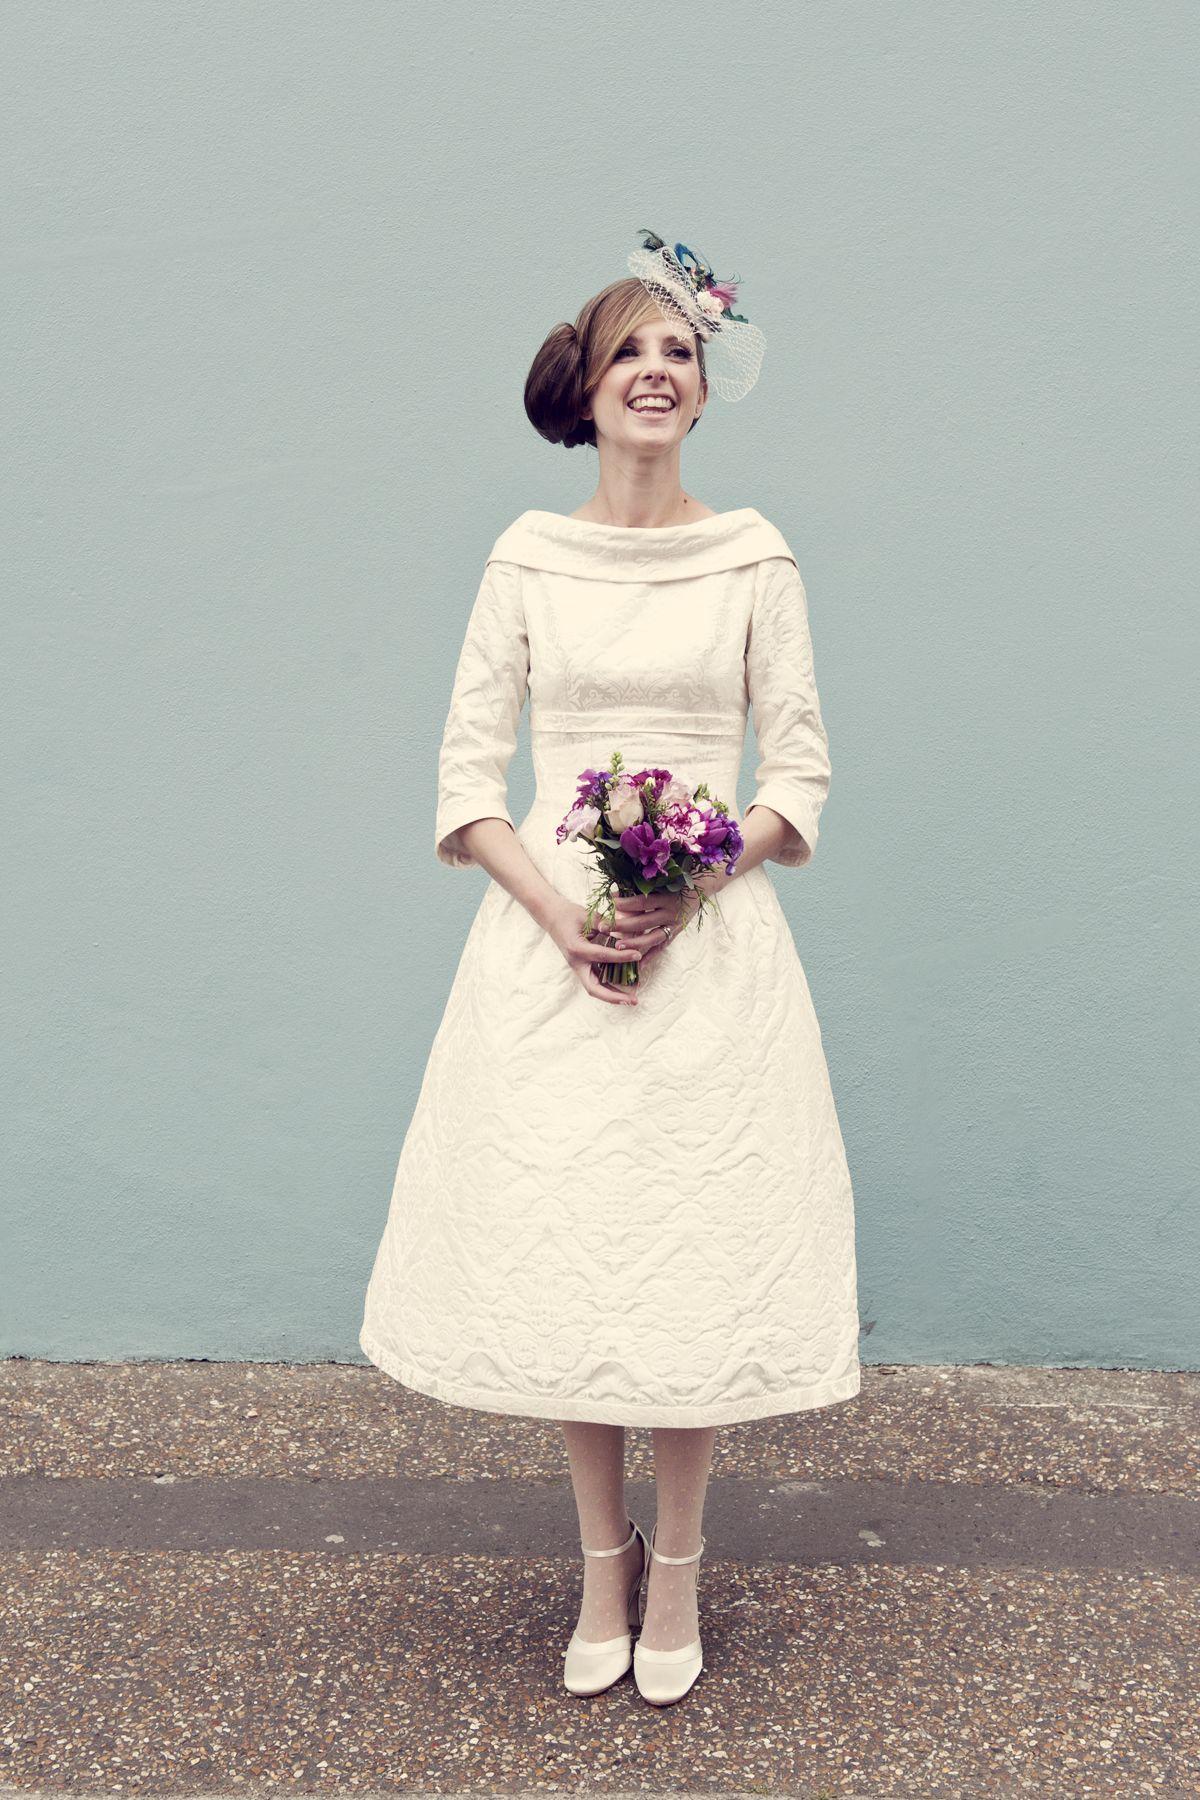 Short Wedding Dress And Stunning Heels